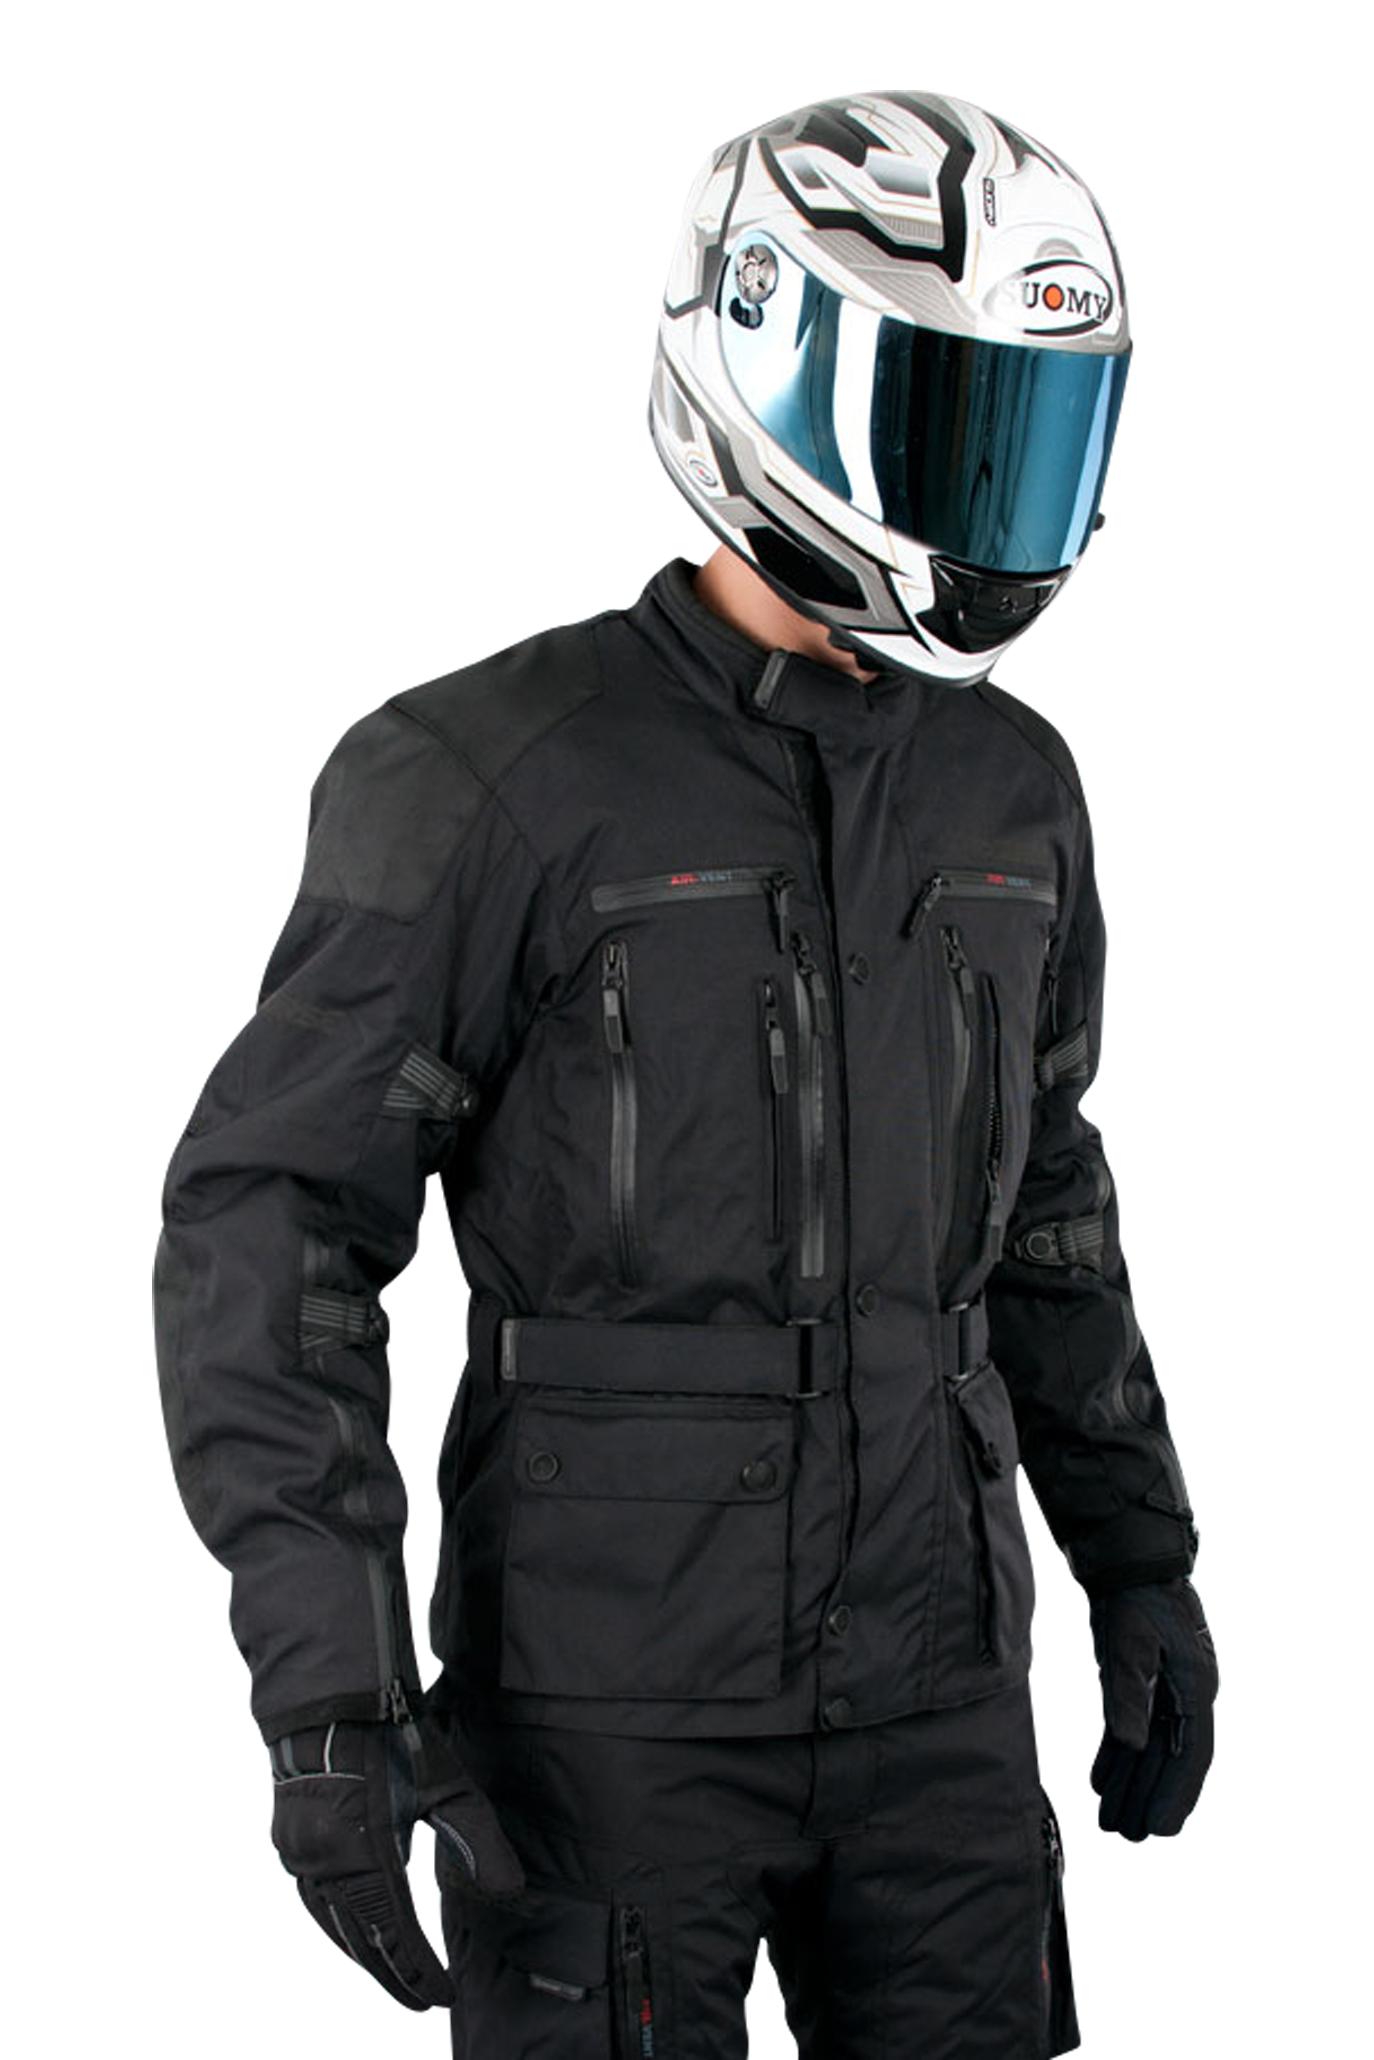 course giacca moto  four seasons 2.0 nera